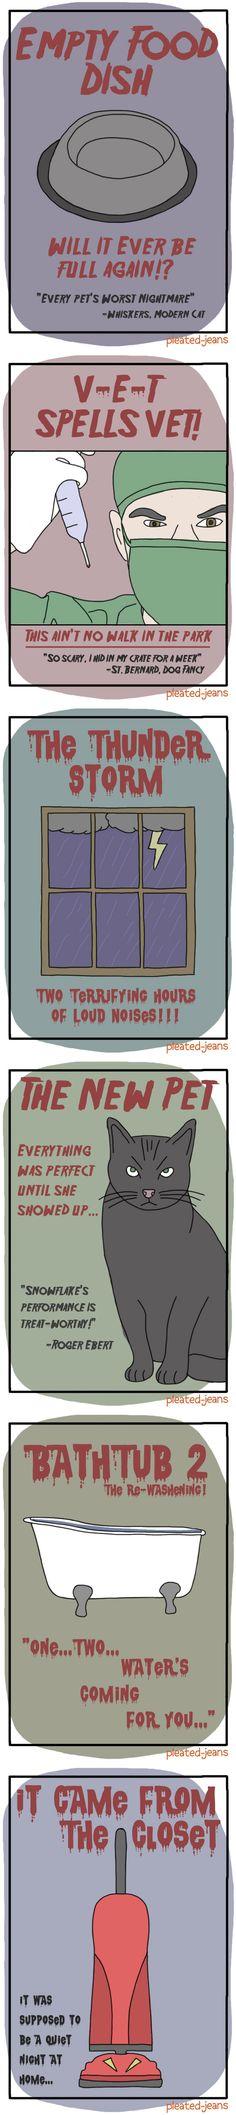 Pet horror movies.